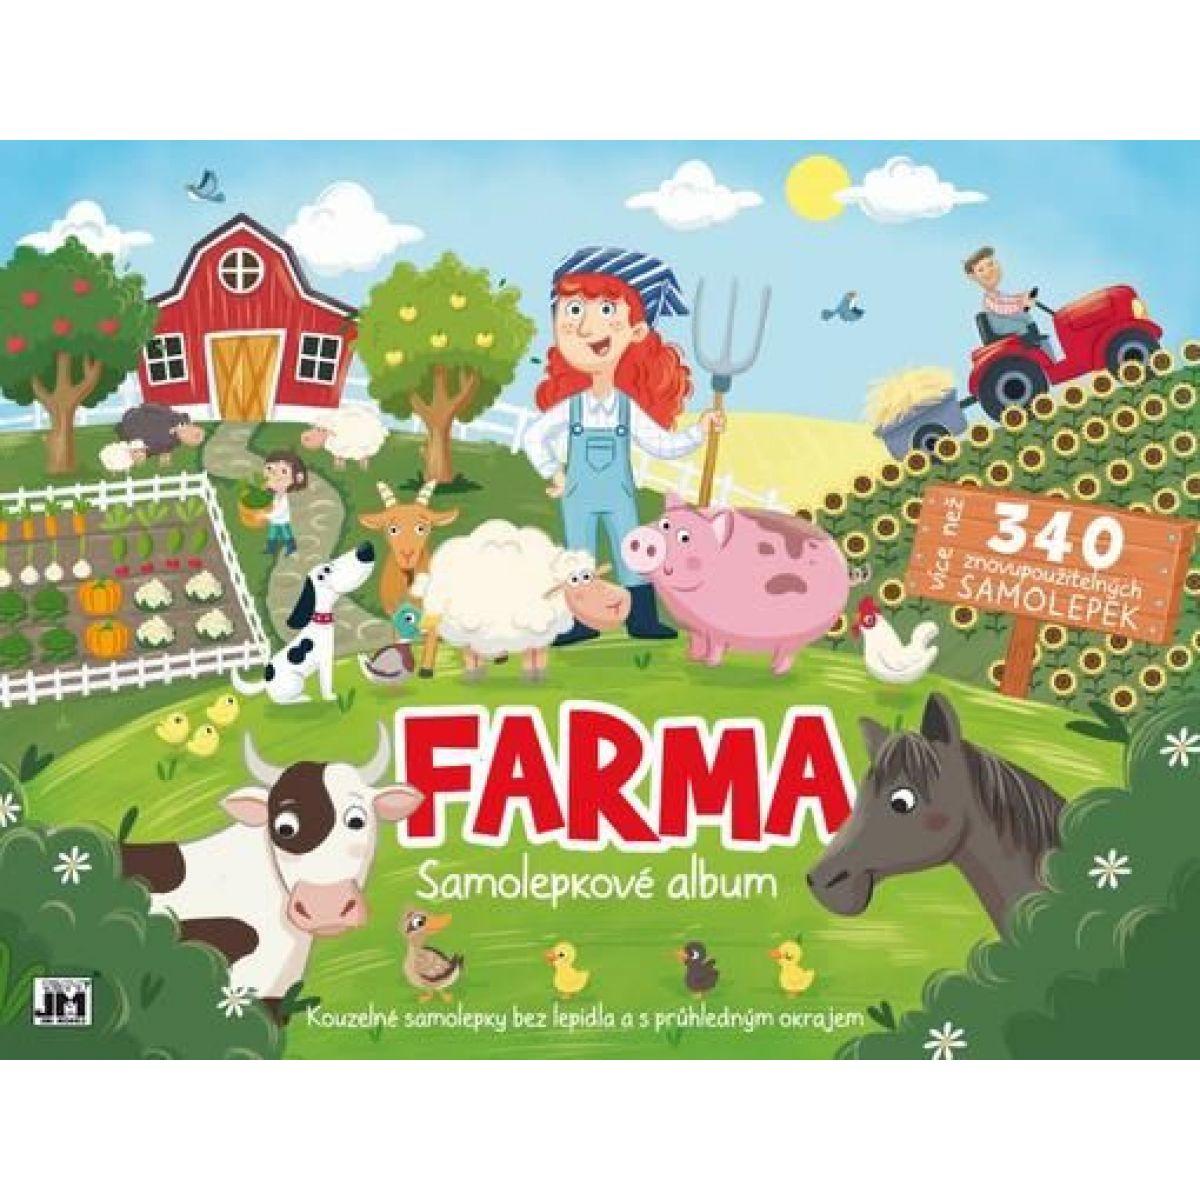 Jiri Models Bav sa a nalepuj Farma